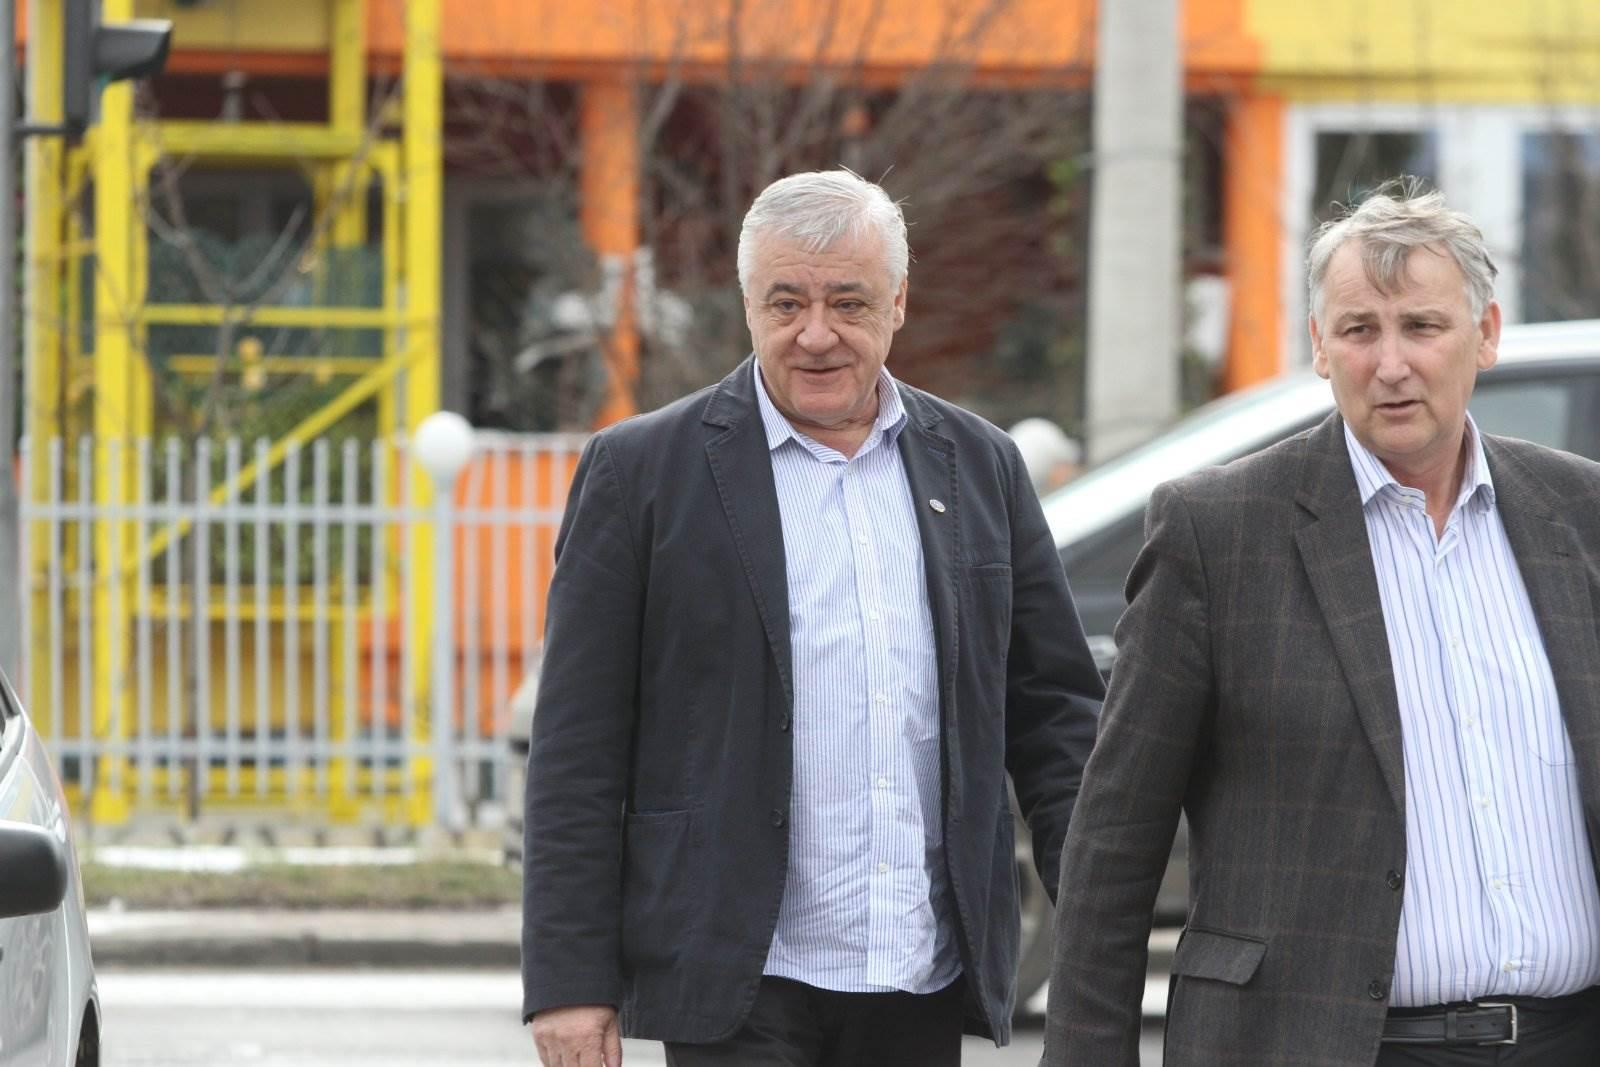 Bosnian Serb Veterans' Leader Denies Assisting Srebrenica Genocide